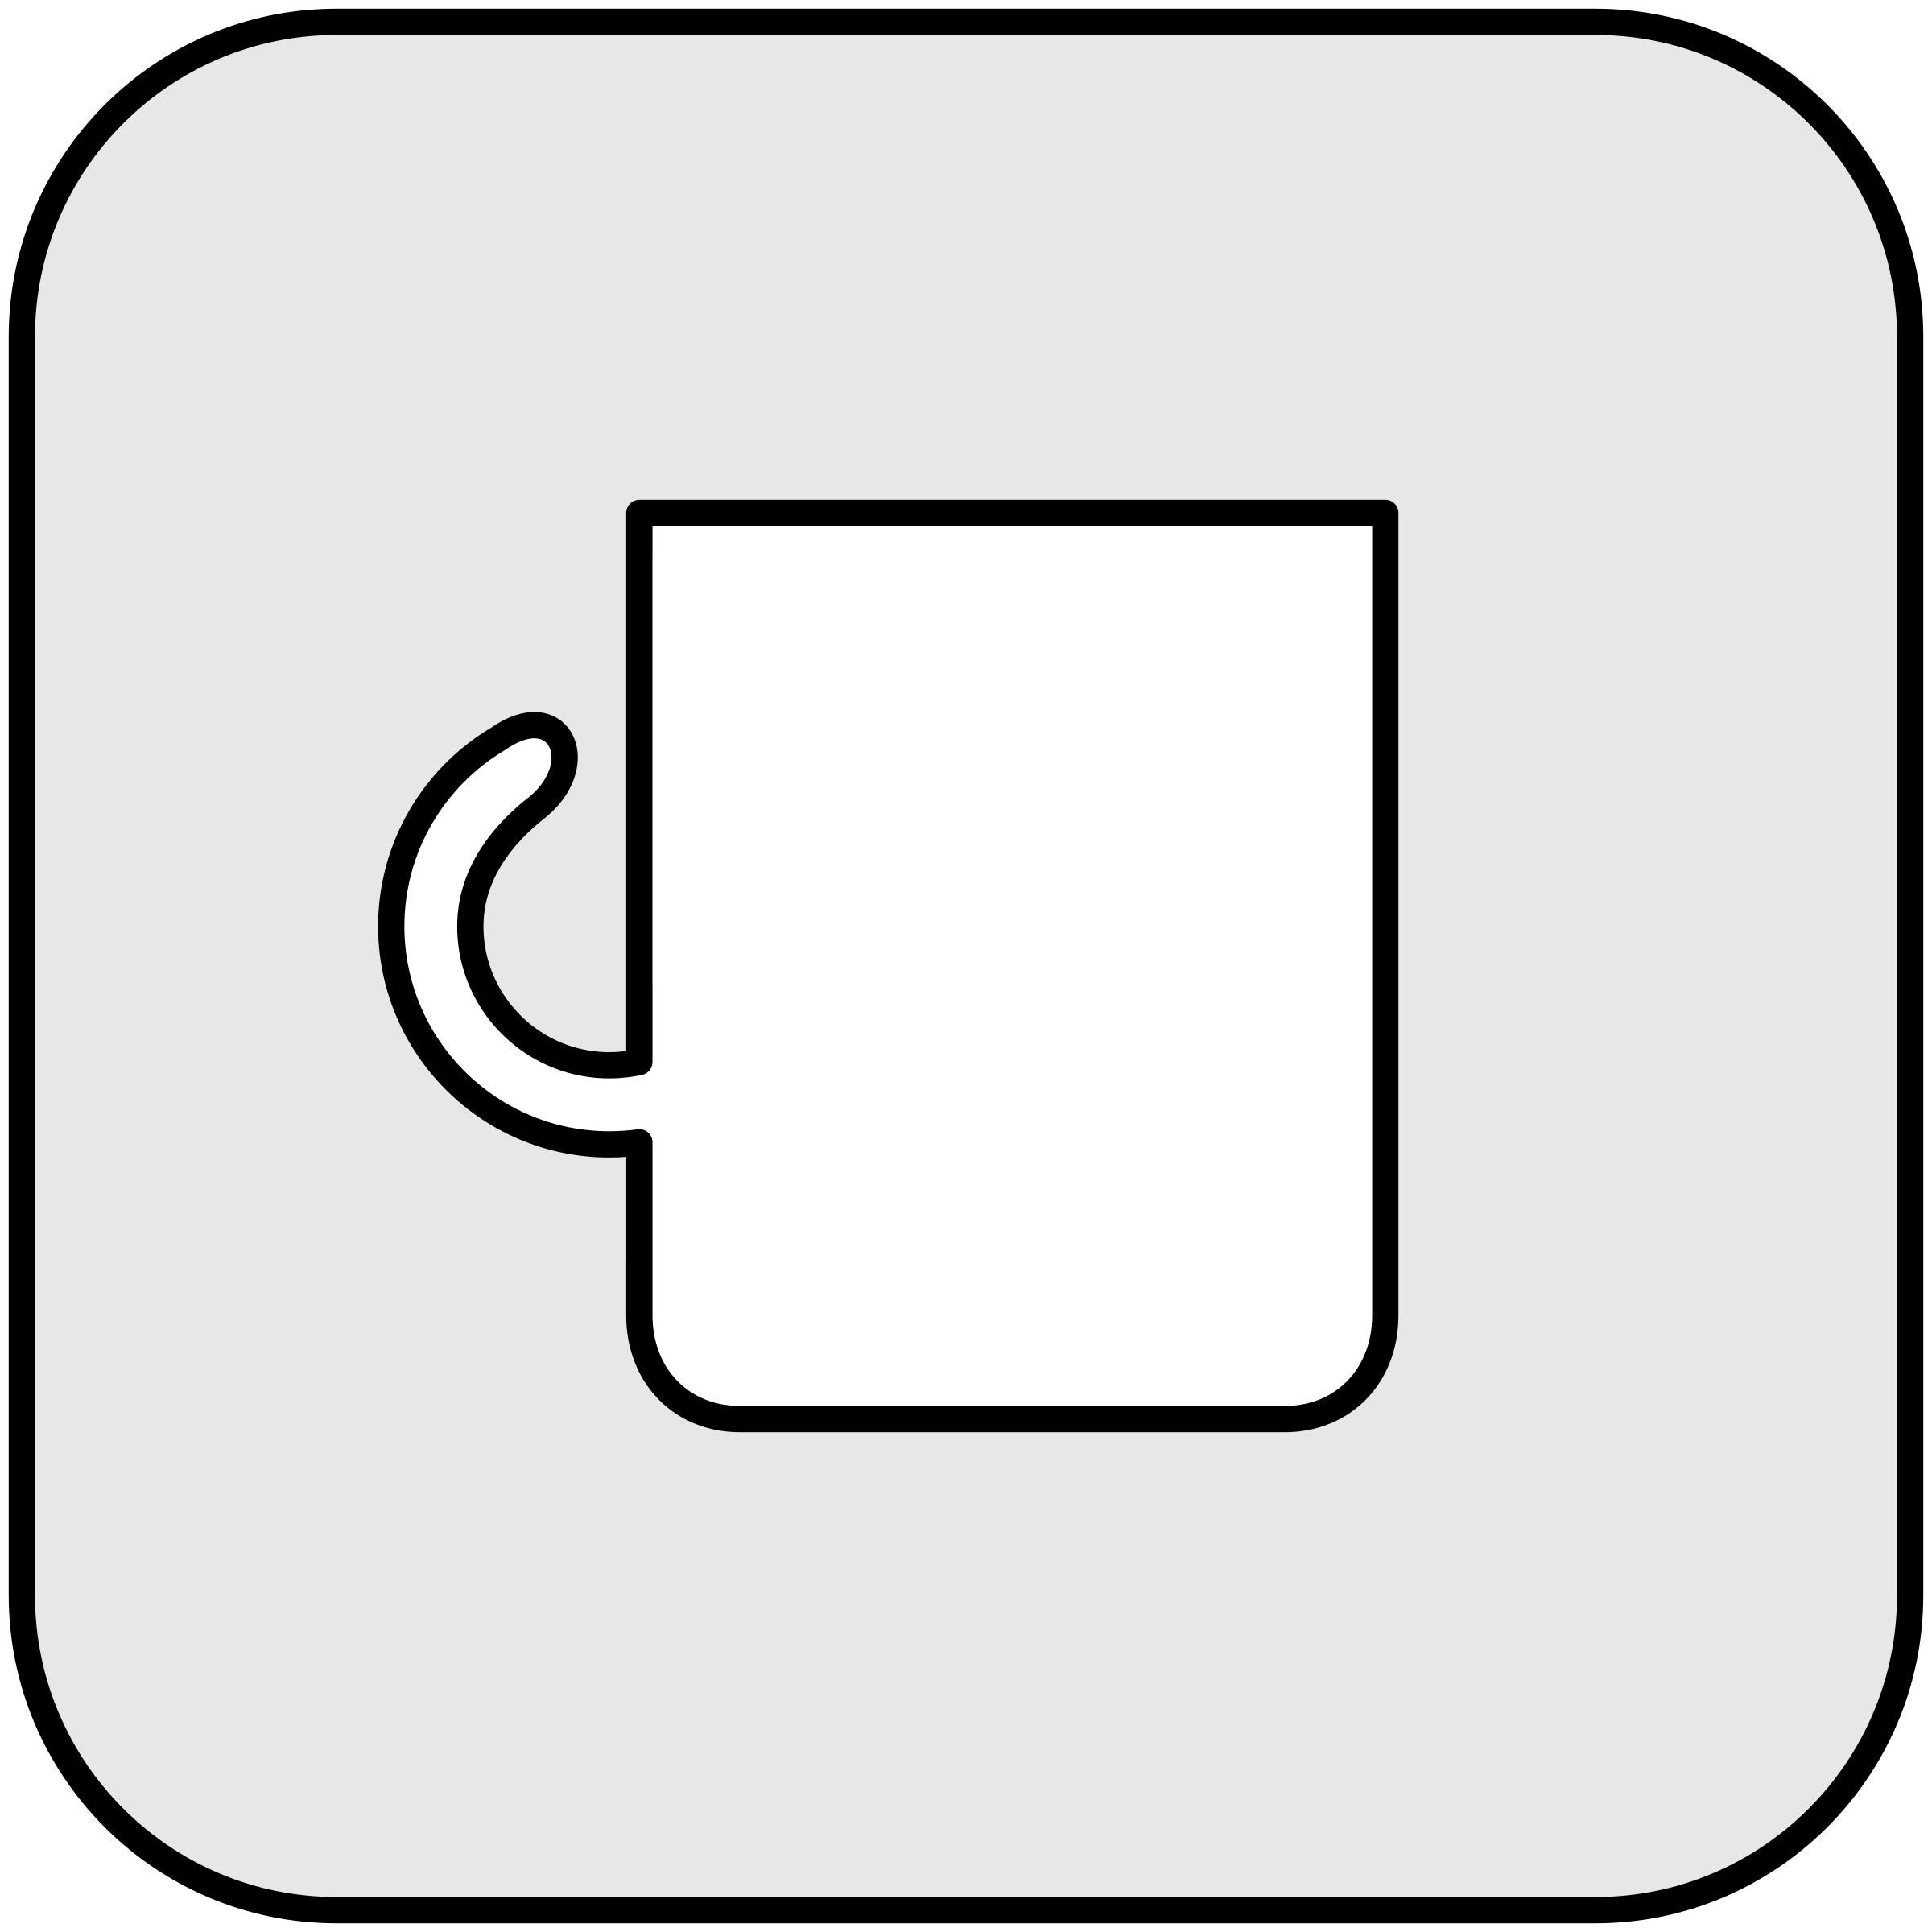 JP ICONS - CUP.jpg